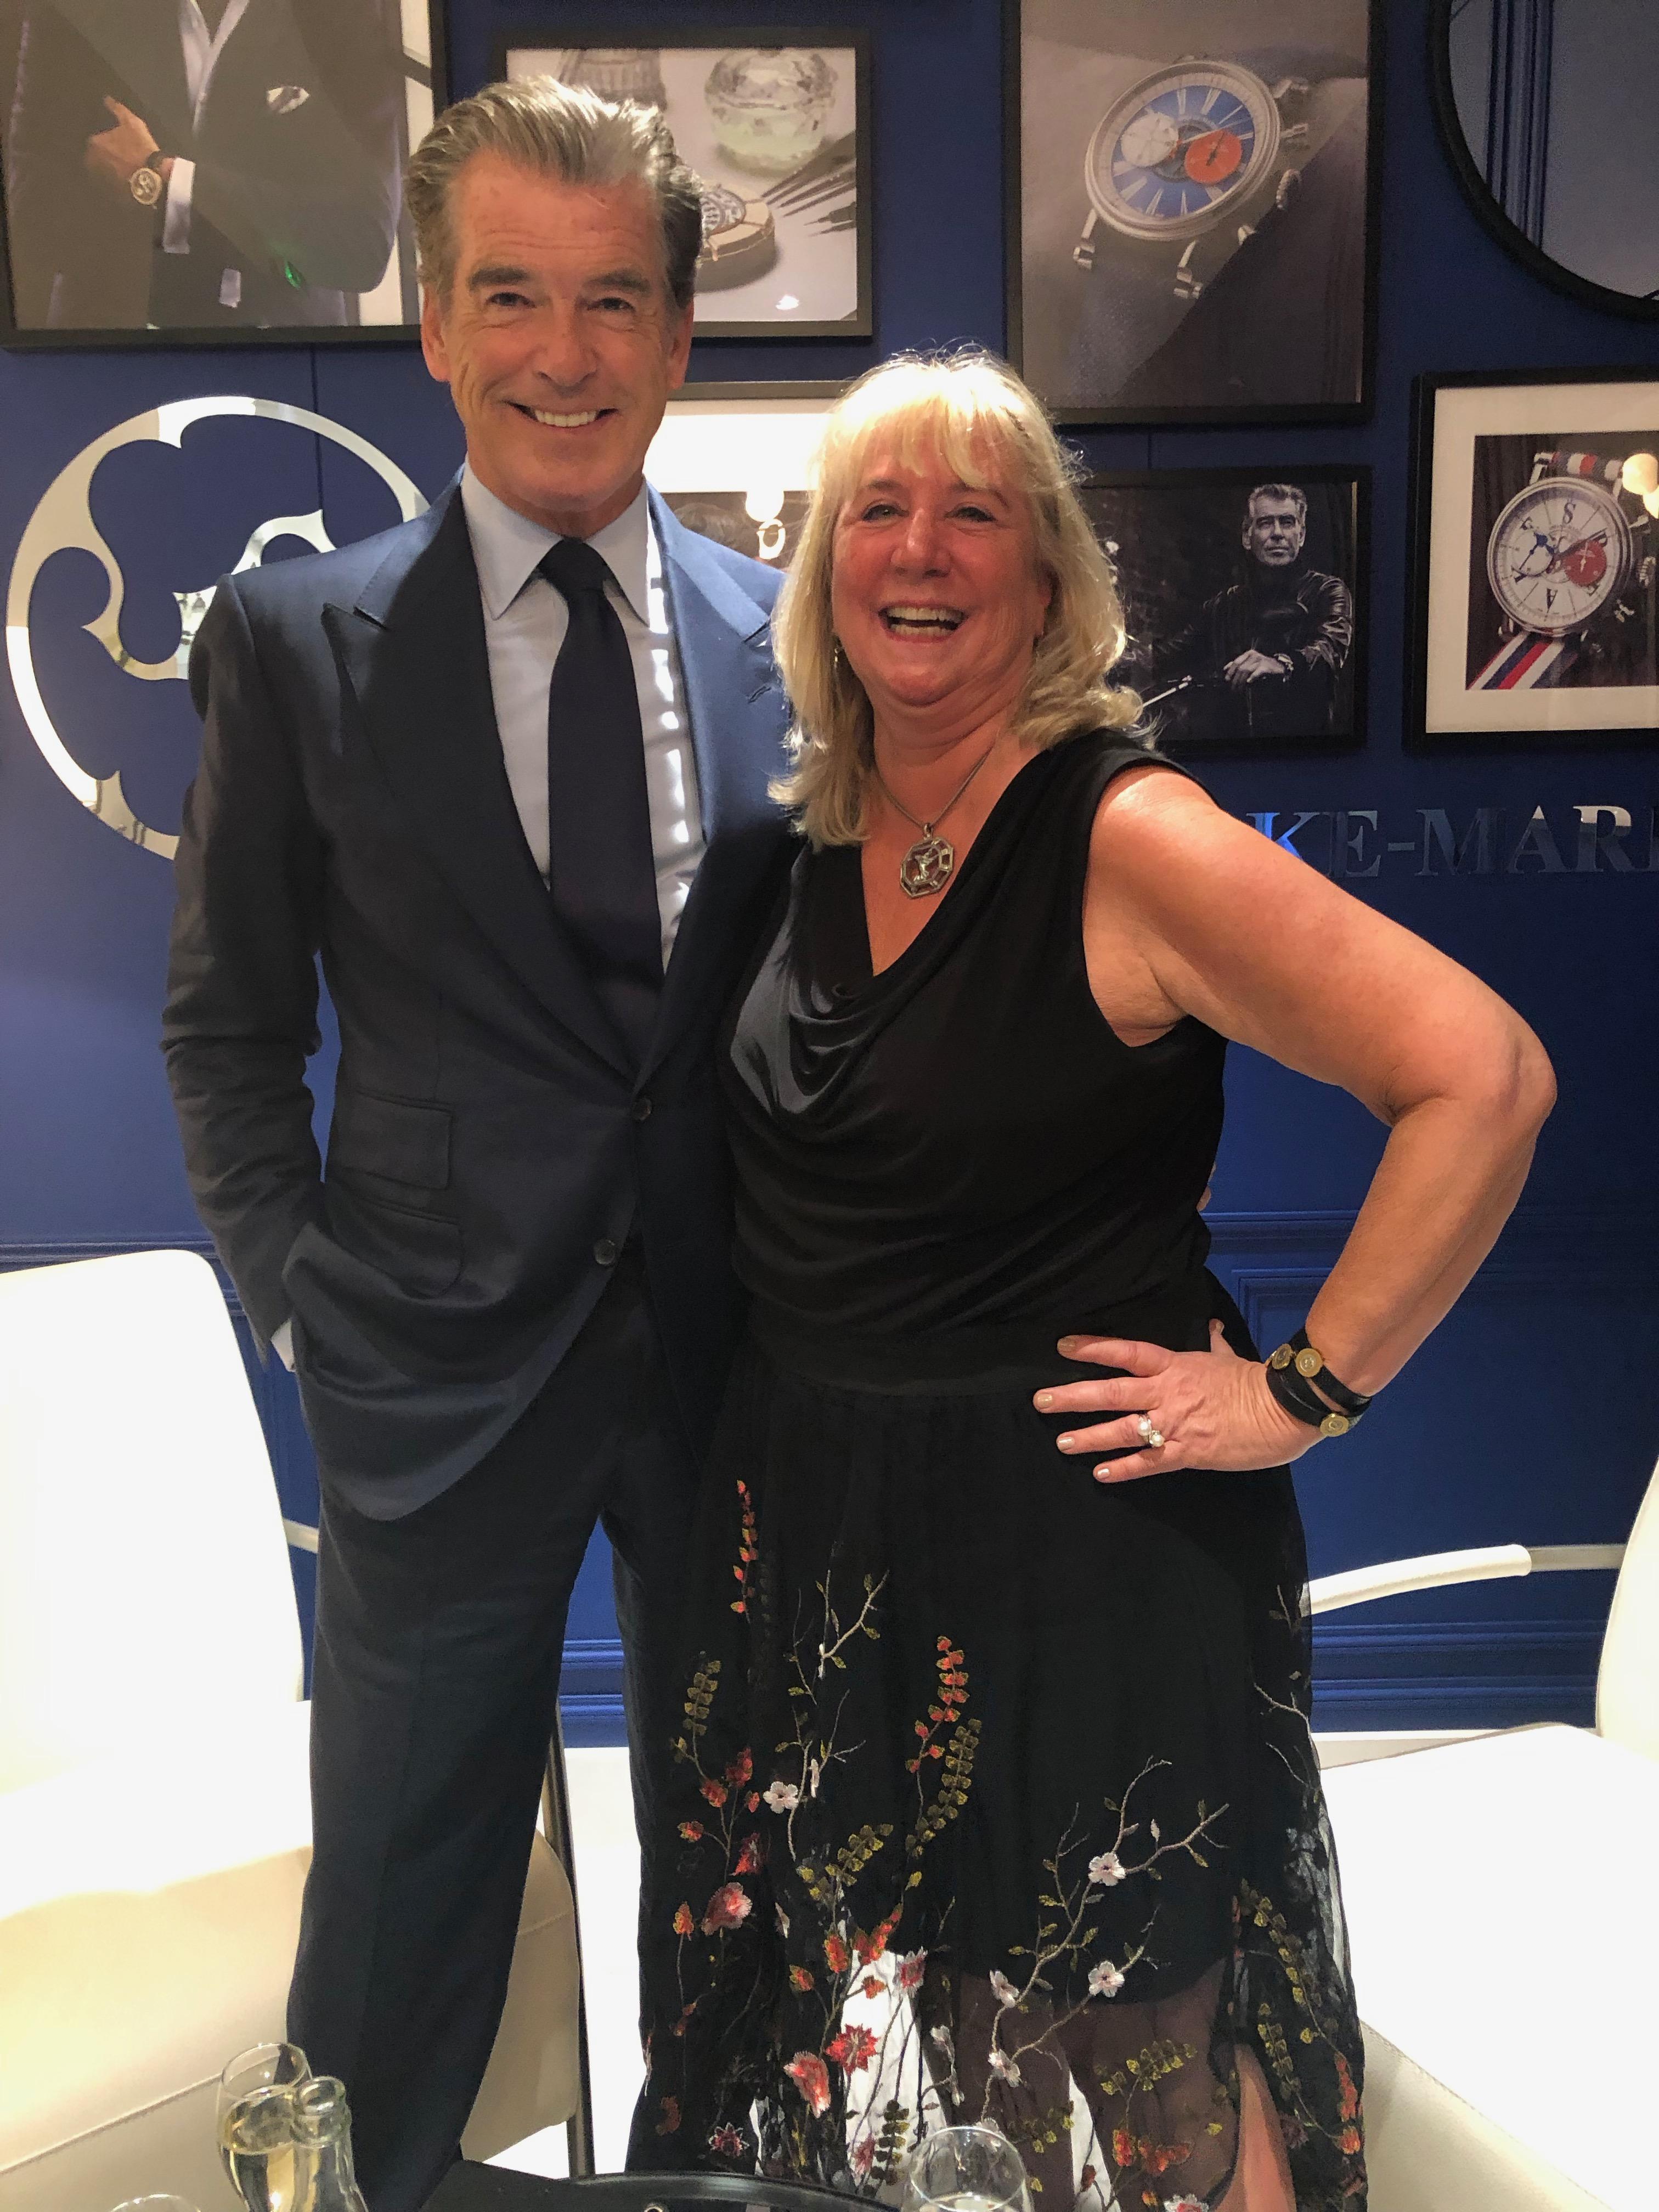 Pierce Brosnan with Roberta Naas at Speake-Marin booth at SIHH 2019